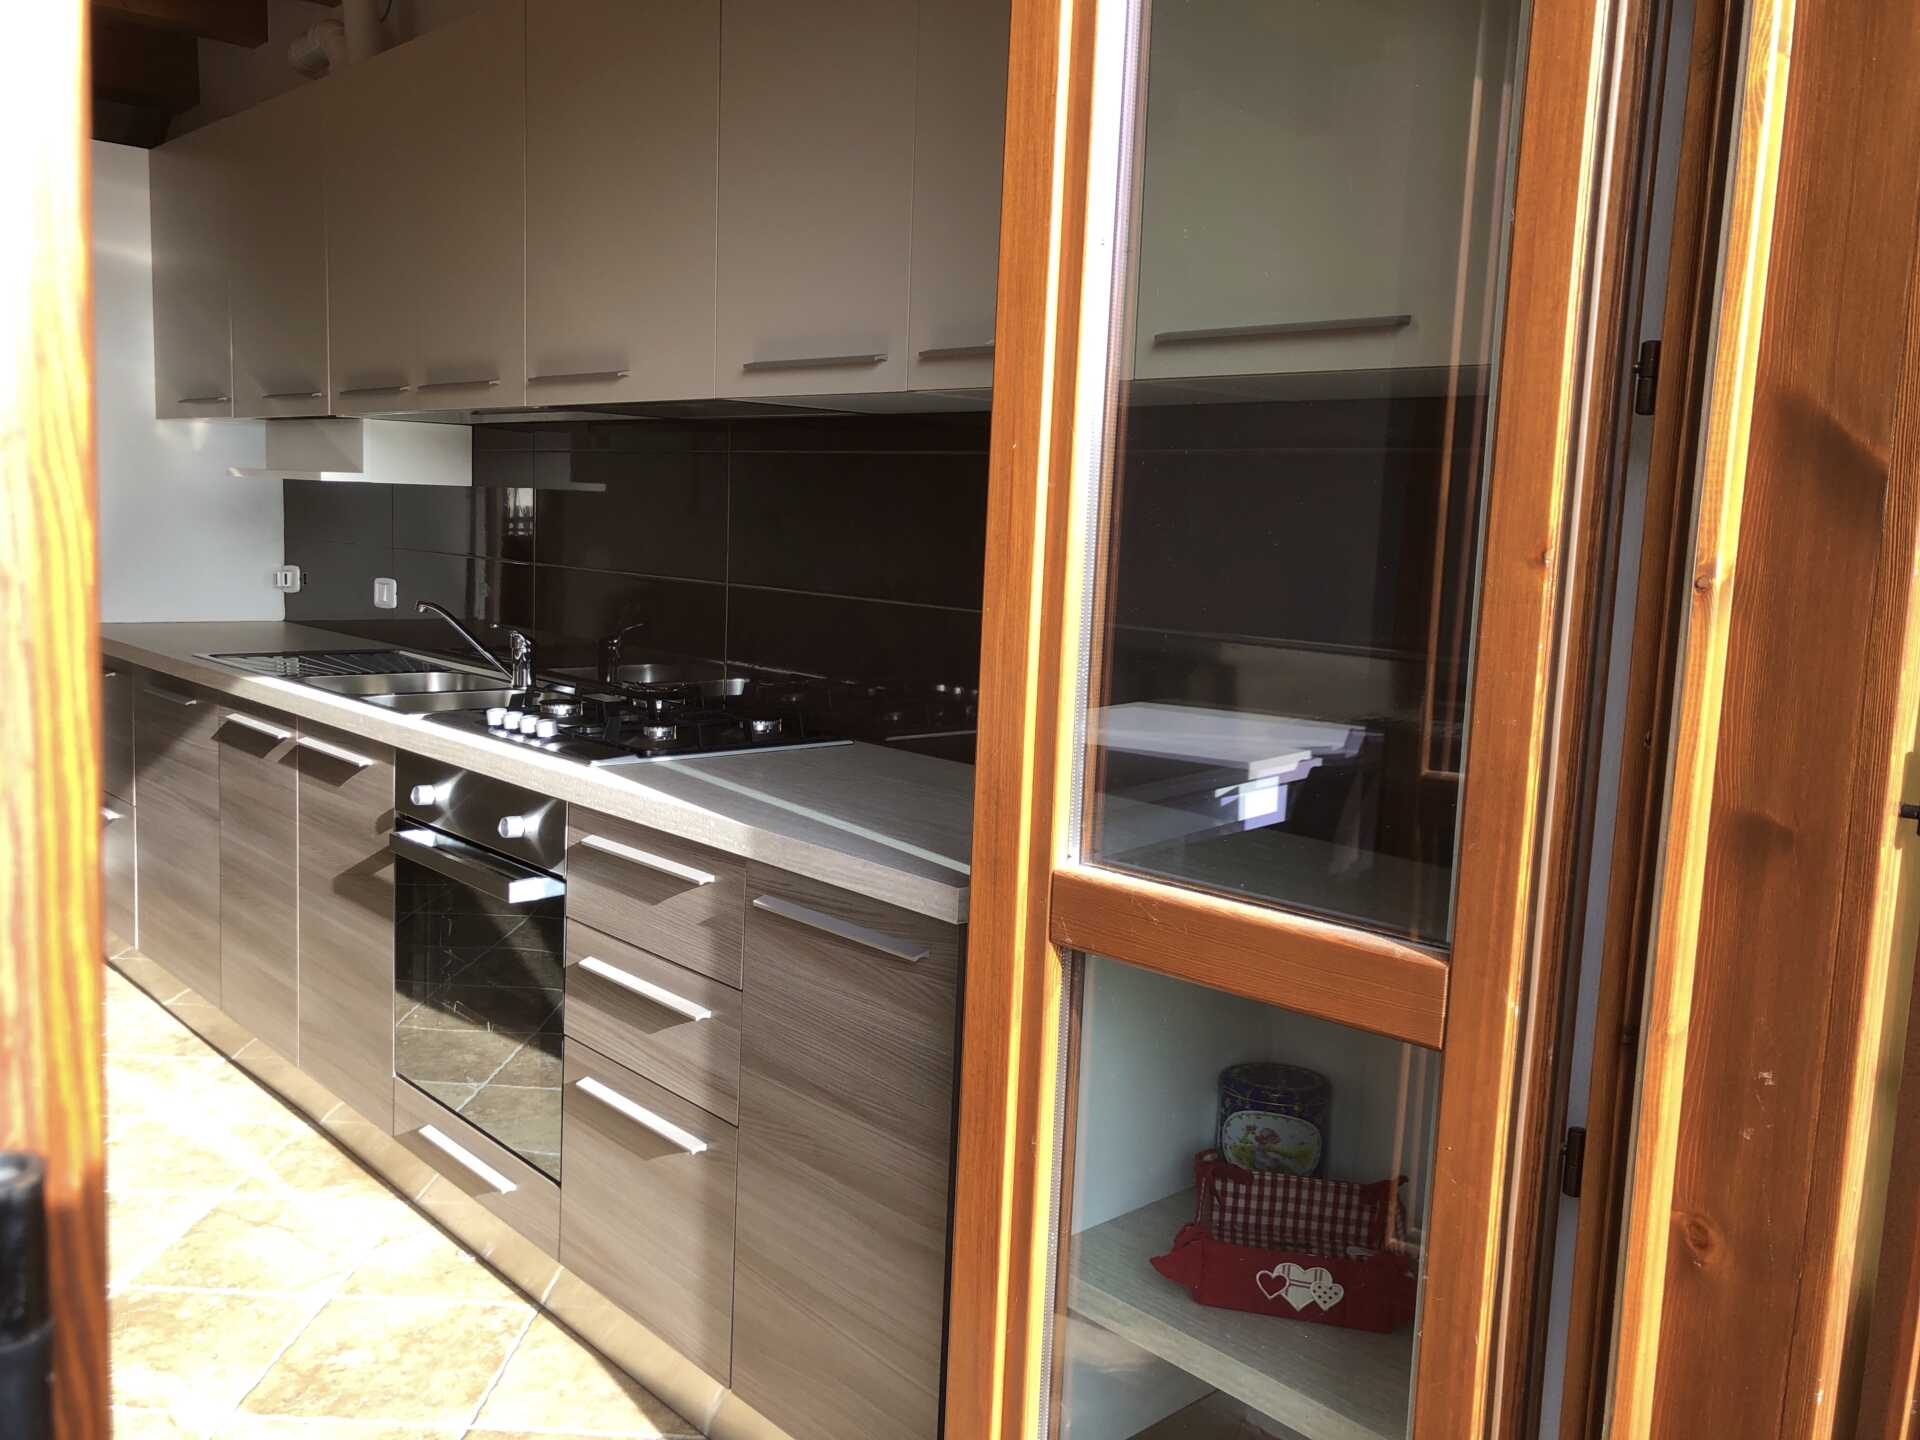 Casa-vacanze-in-vendita-appartamento-a-Dossena (7)